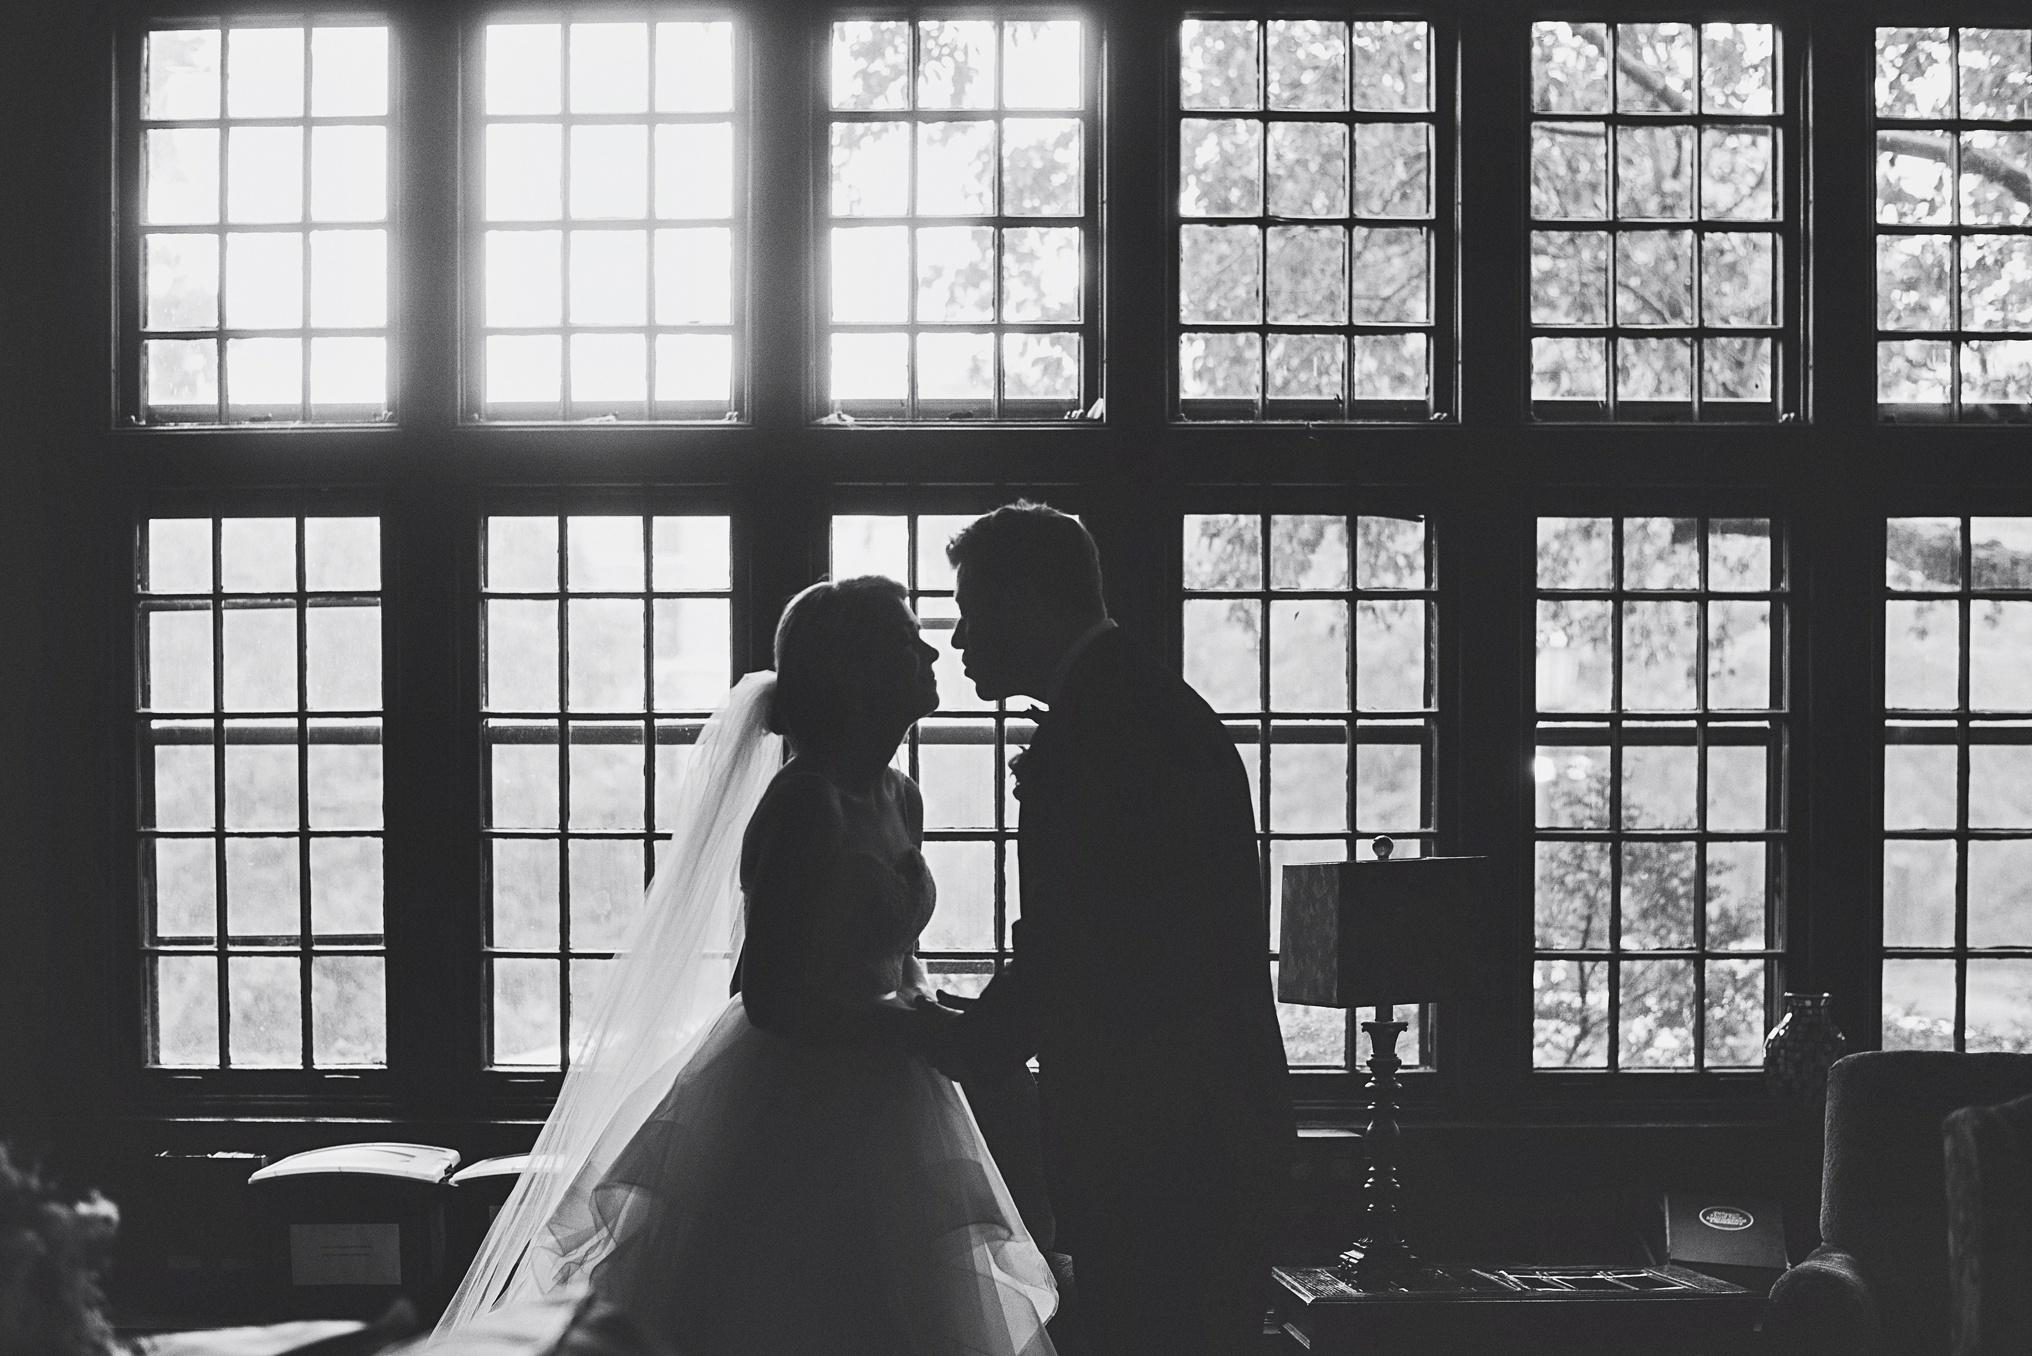 best_wedding_photography_2017_by_lucas_botz_photography_111.jpg